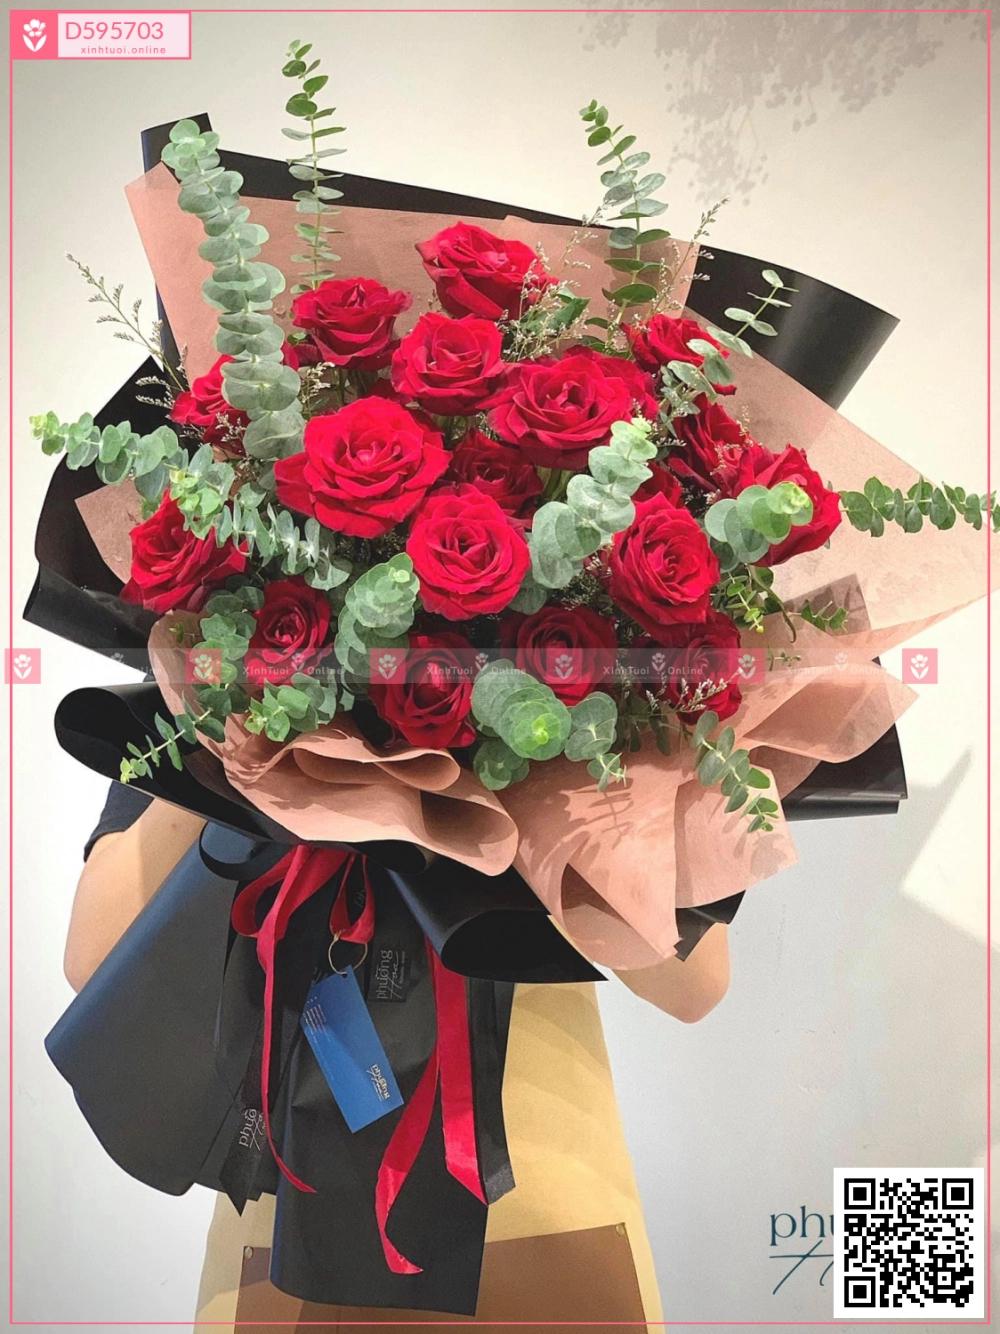 Princess ; International Women's Day ; Pretty ; Girls ; Baby ; Mommy - D595703 - xinhtuoi.online